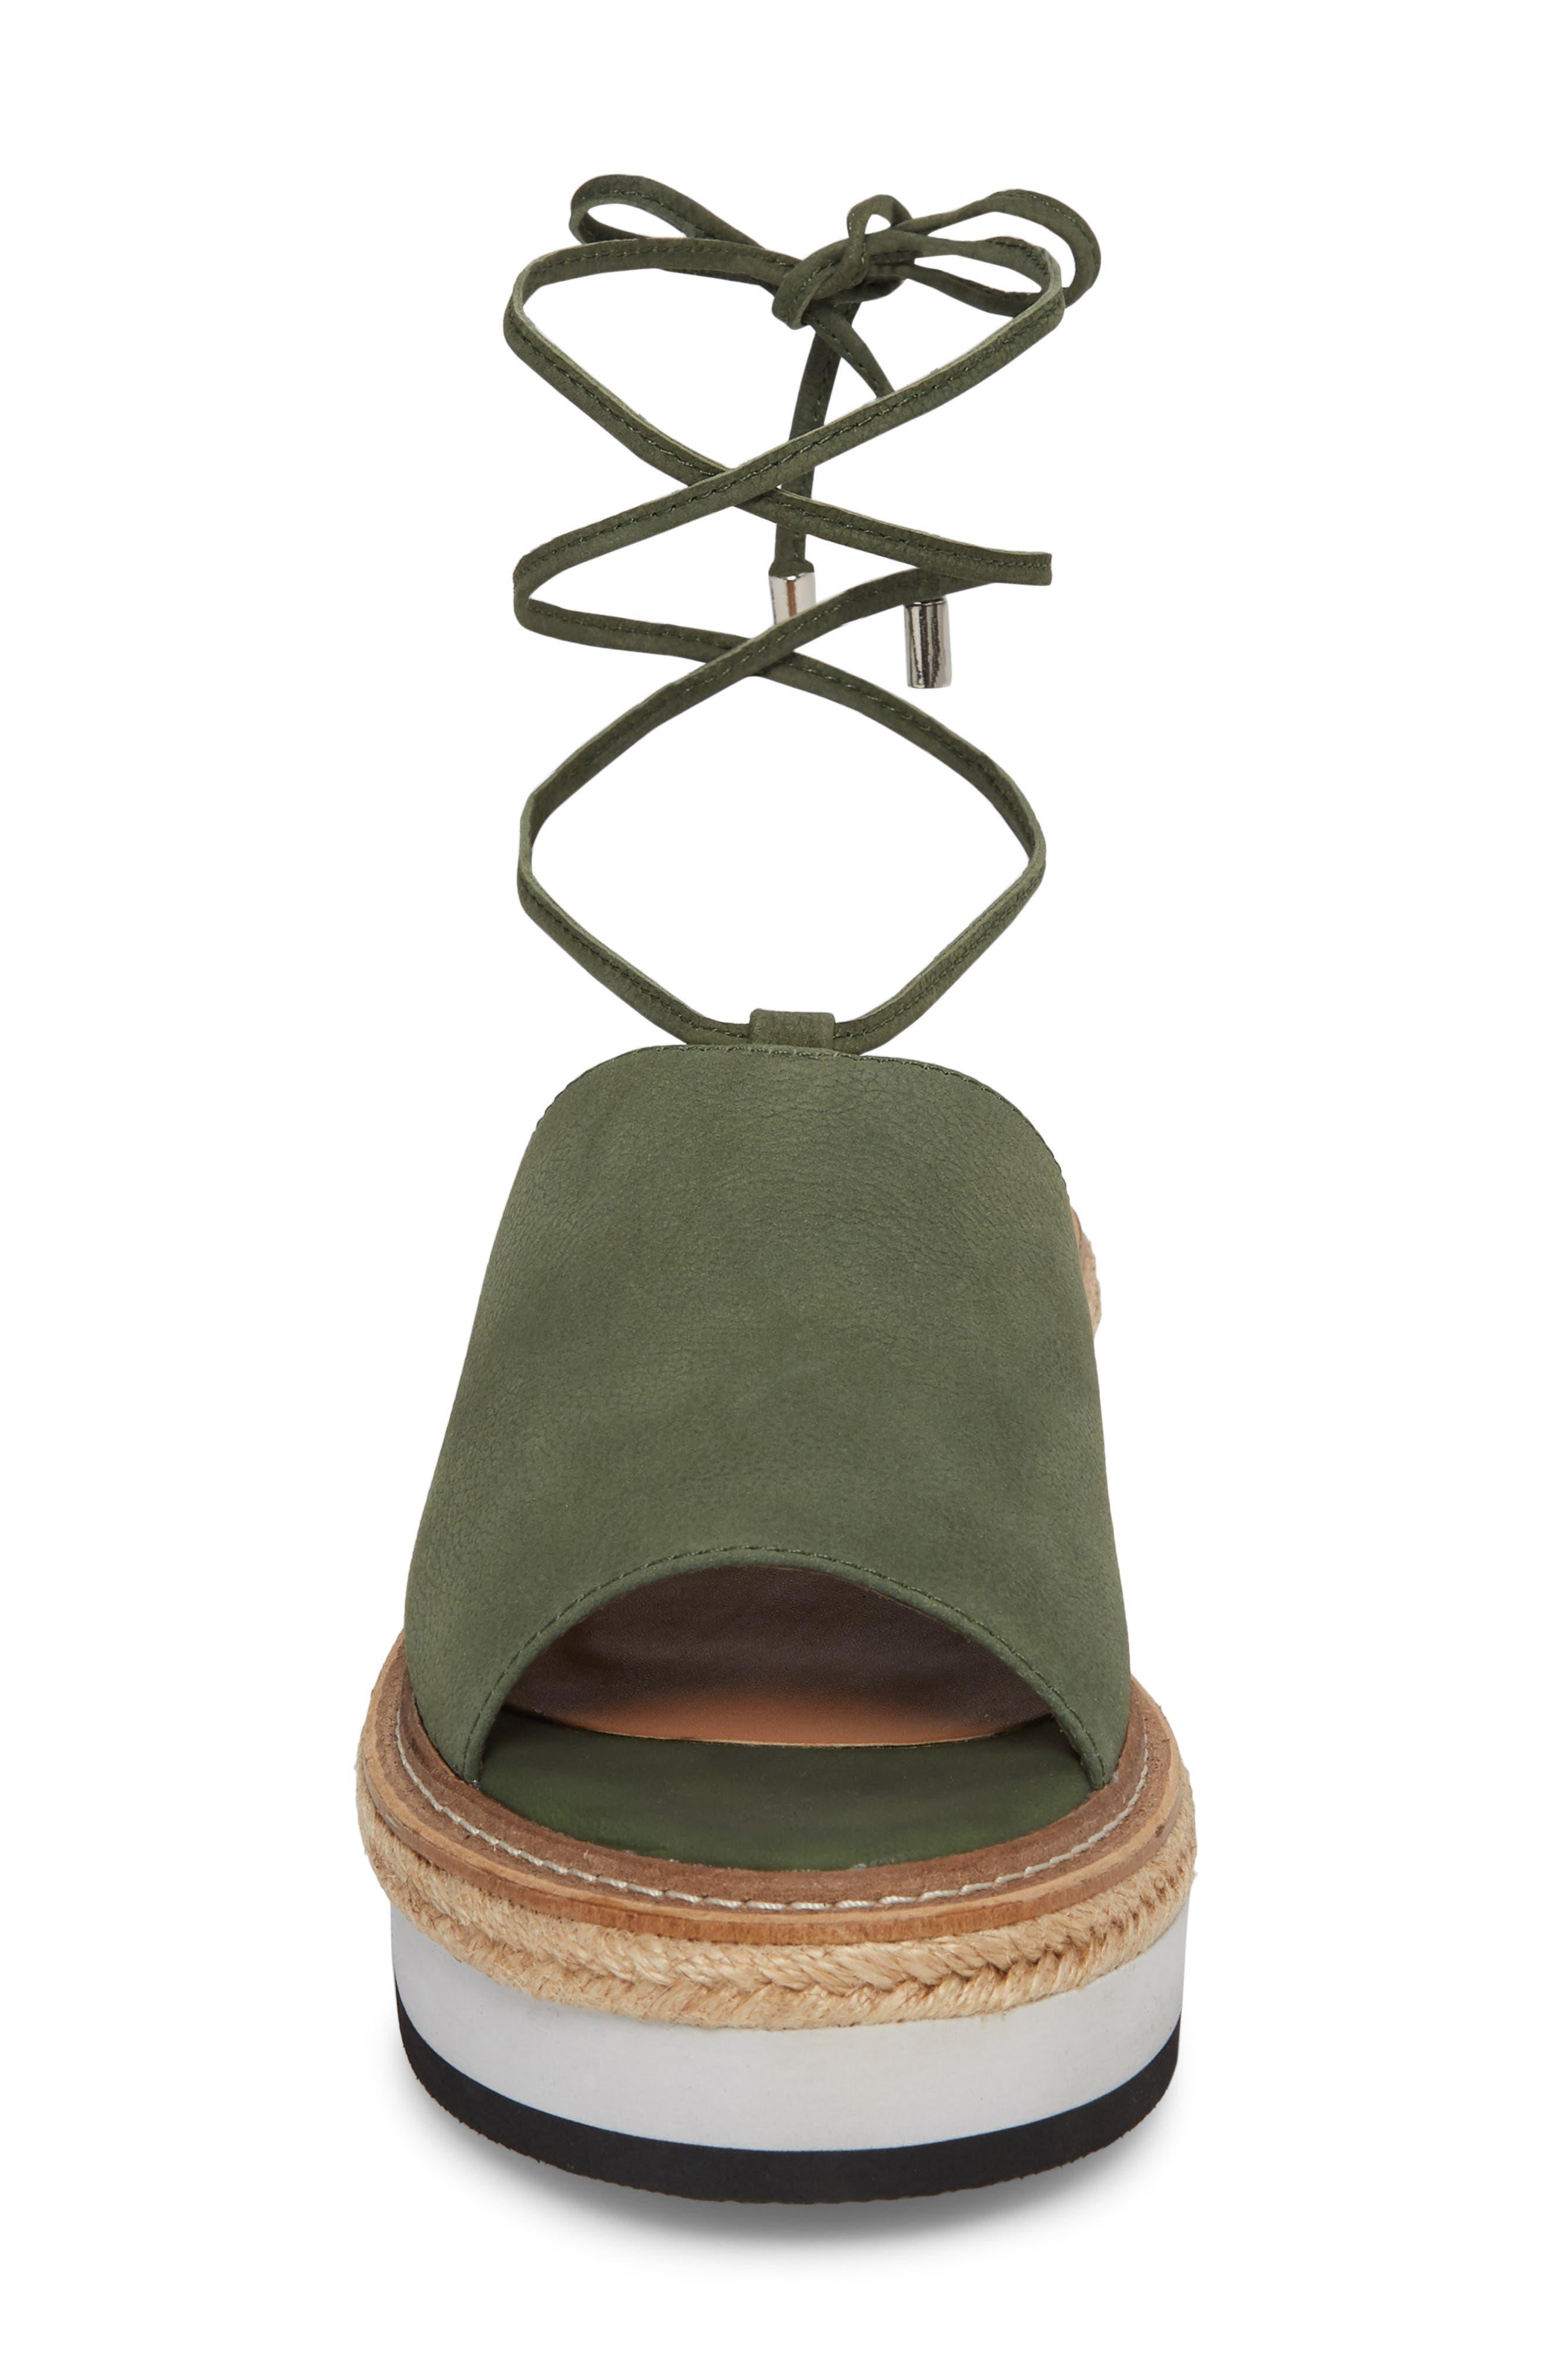 Nickel Platform Sandal,                             Alternate thumbnail 4, color,                             Khaki Nubuck Leather